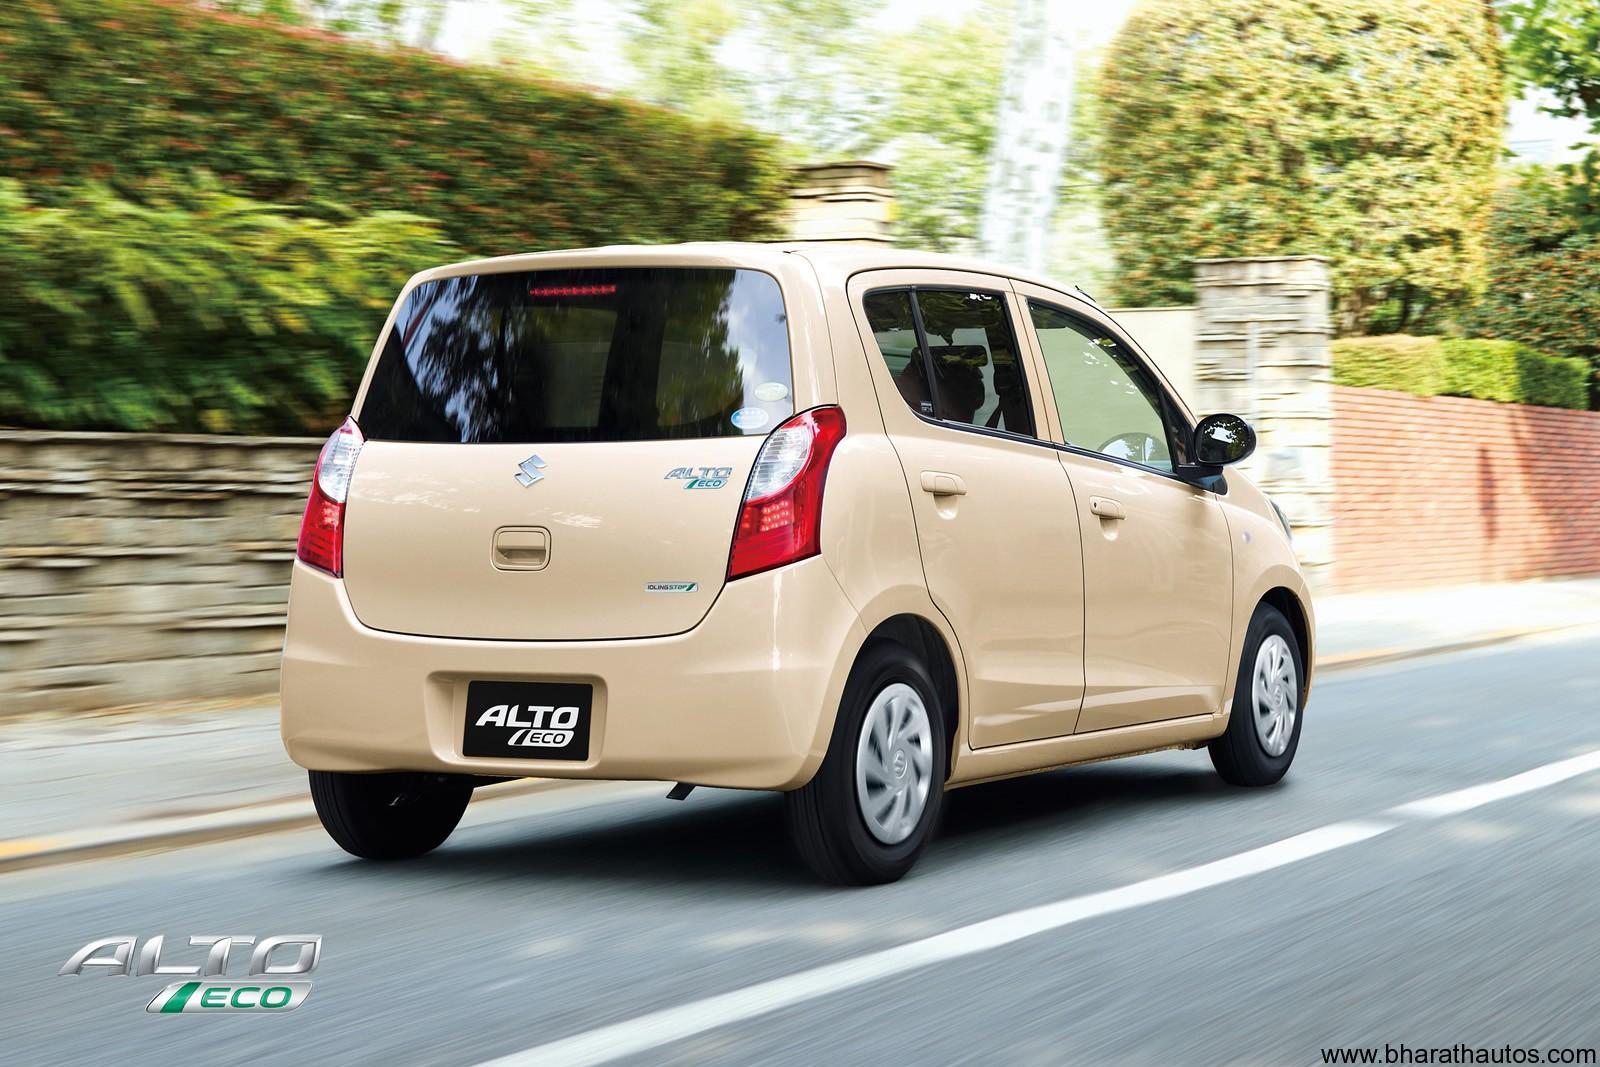 Suzuki Alto Cc Price